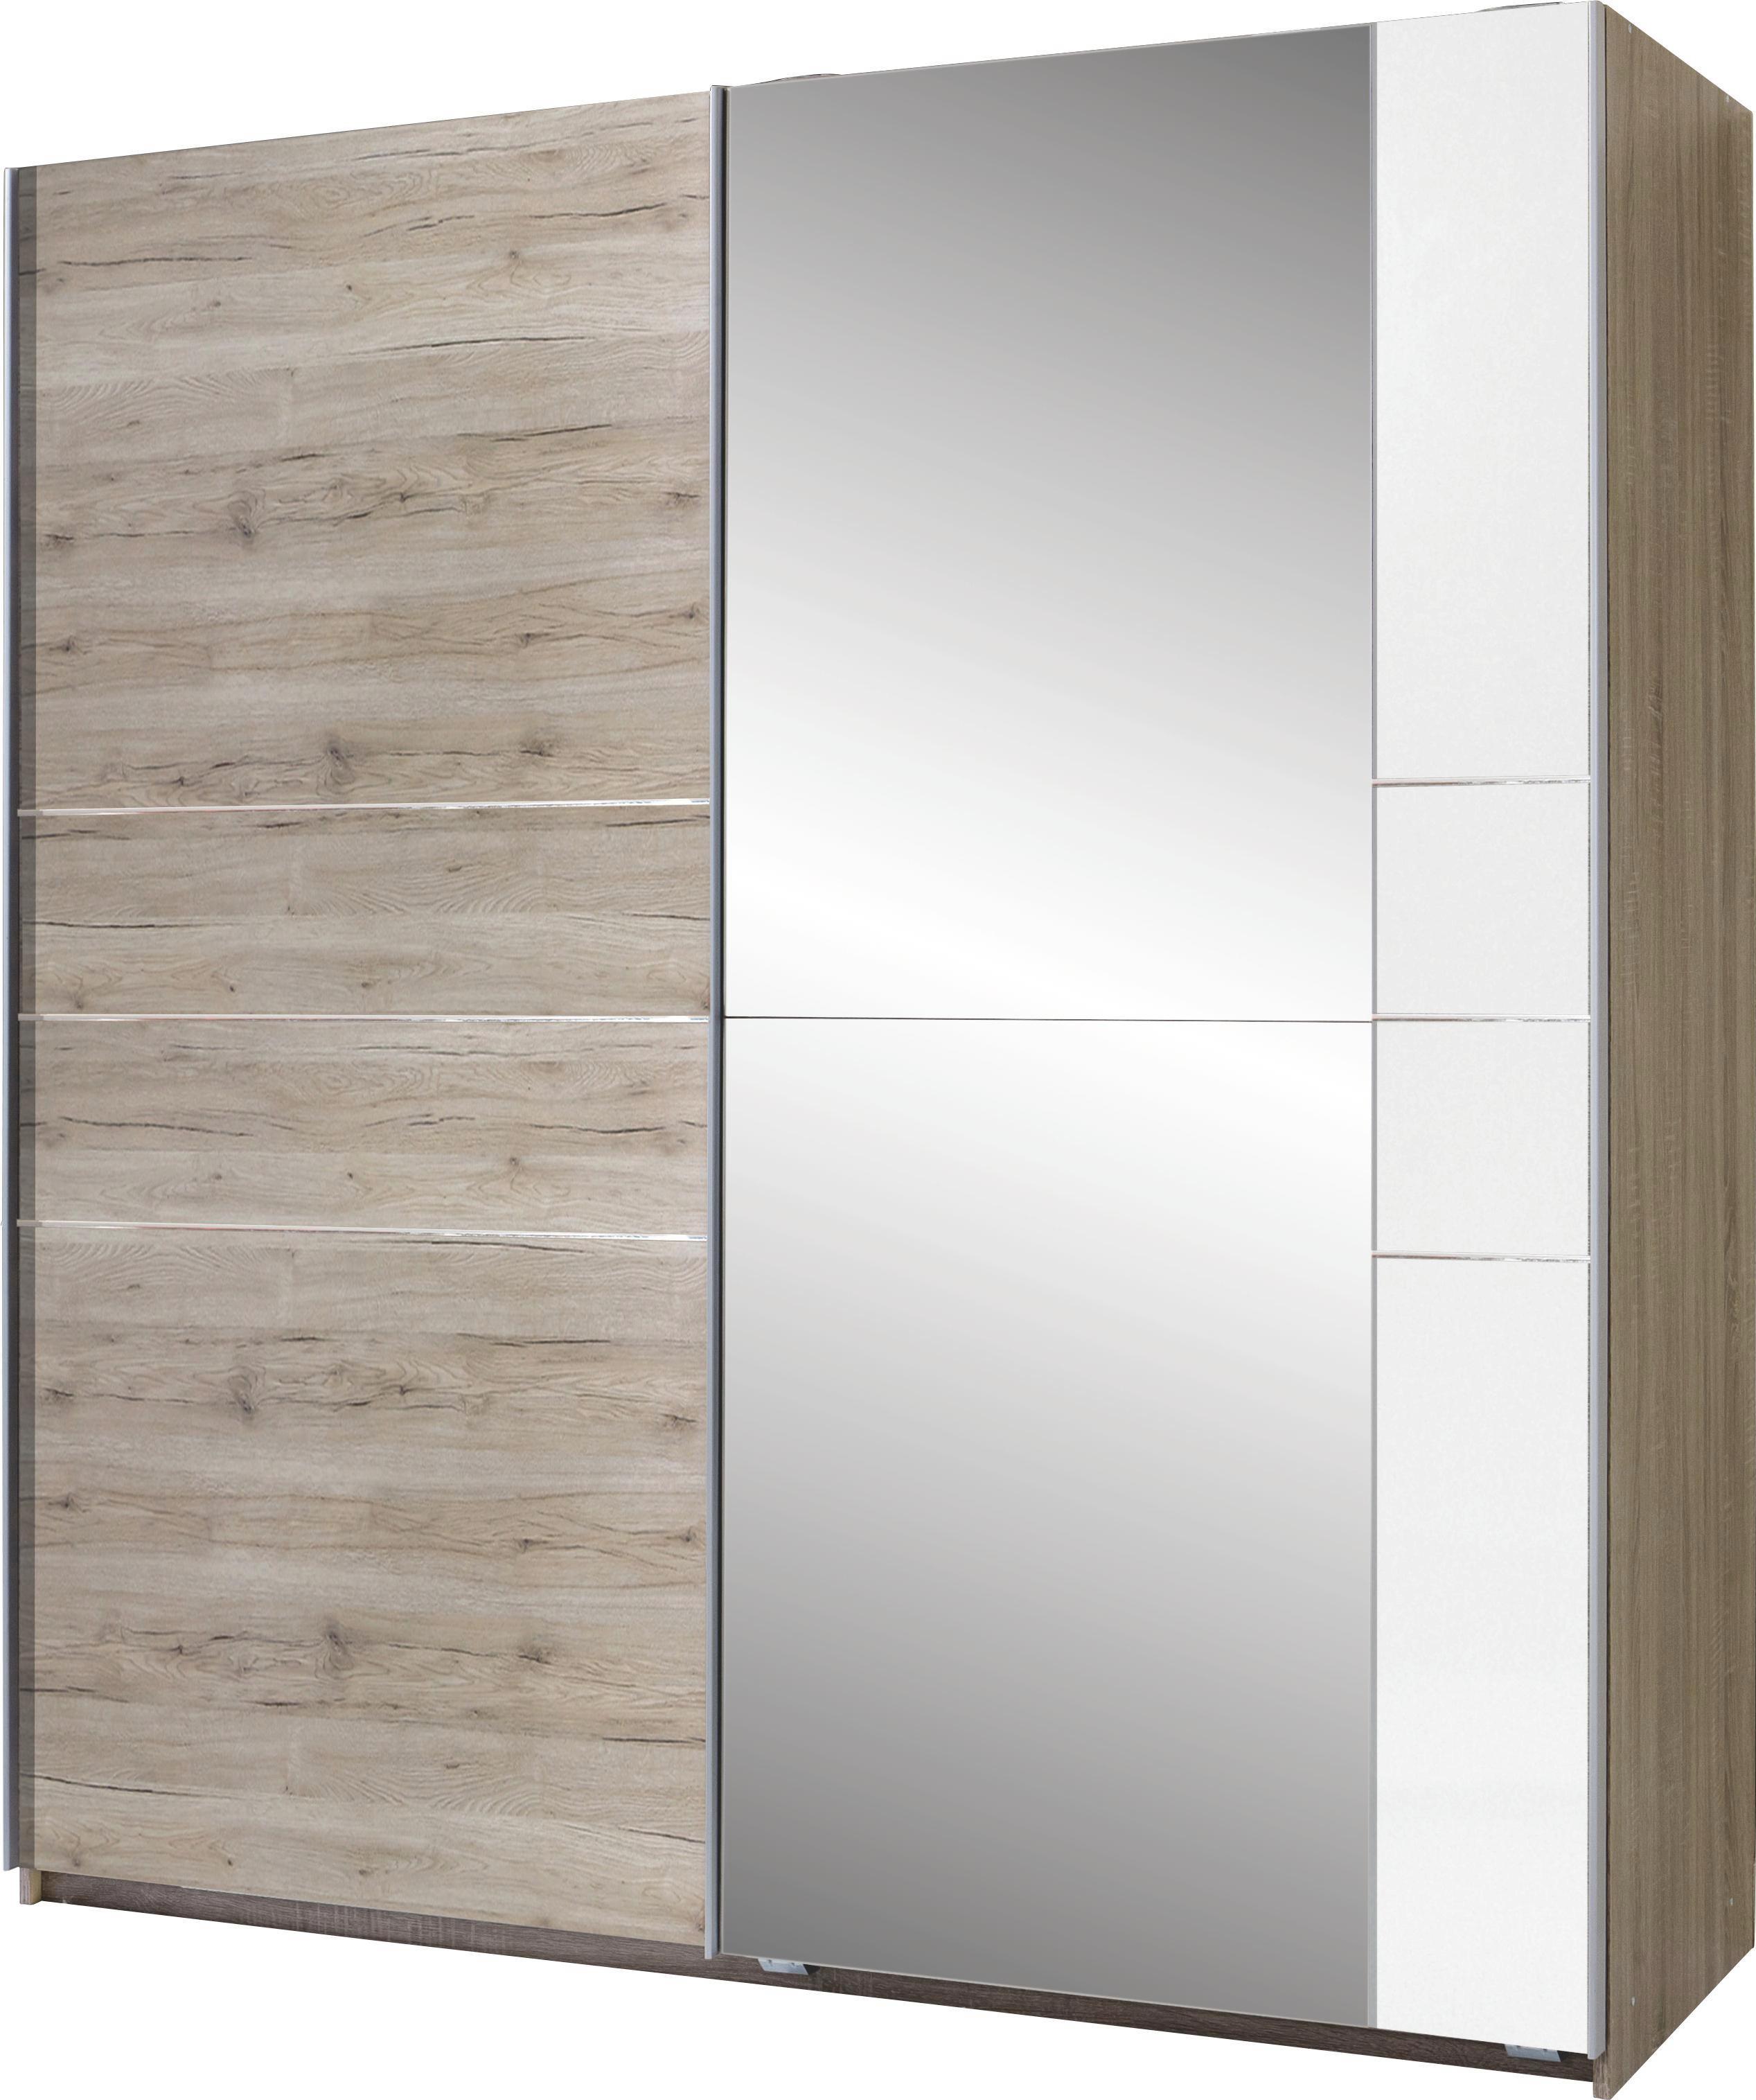 Tolóajtós Szekrény Stripe - tölgy színű, modern, fa (180/198/64cm)